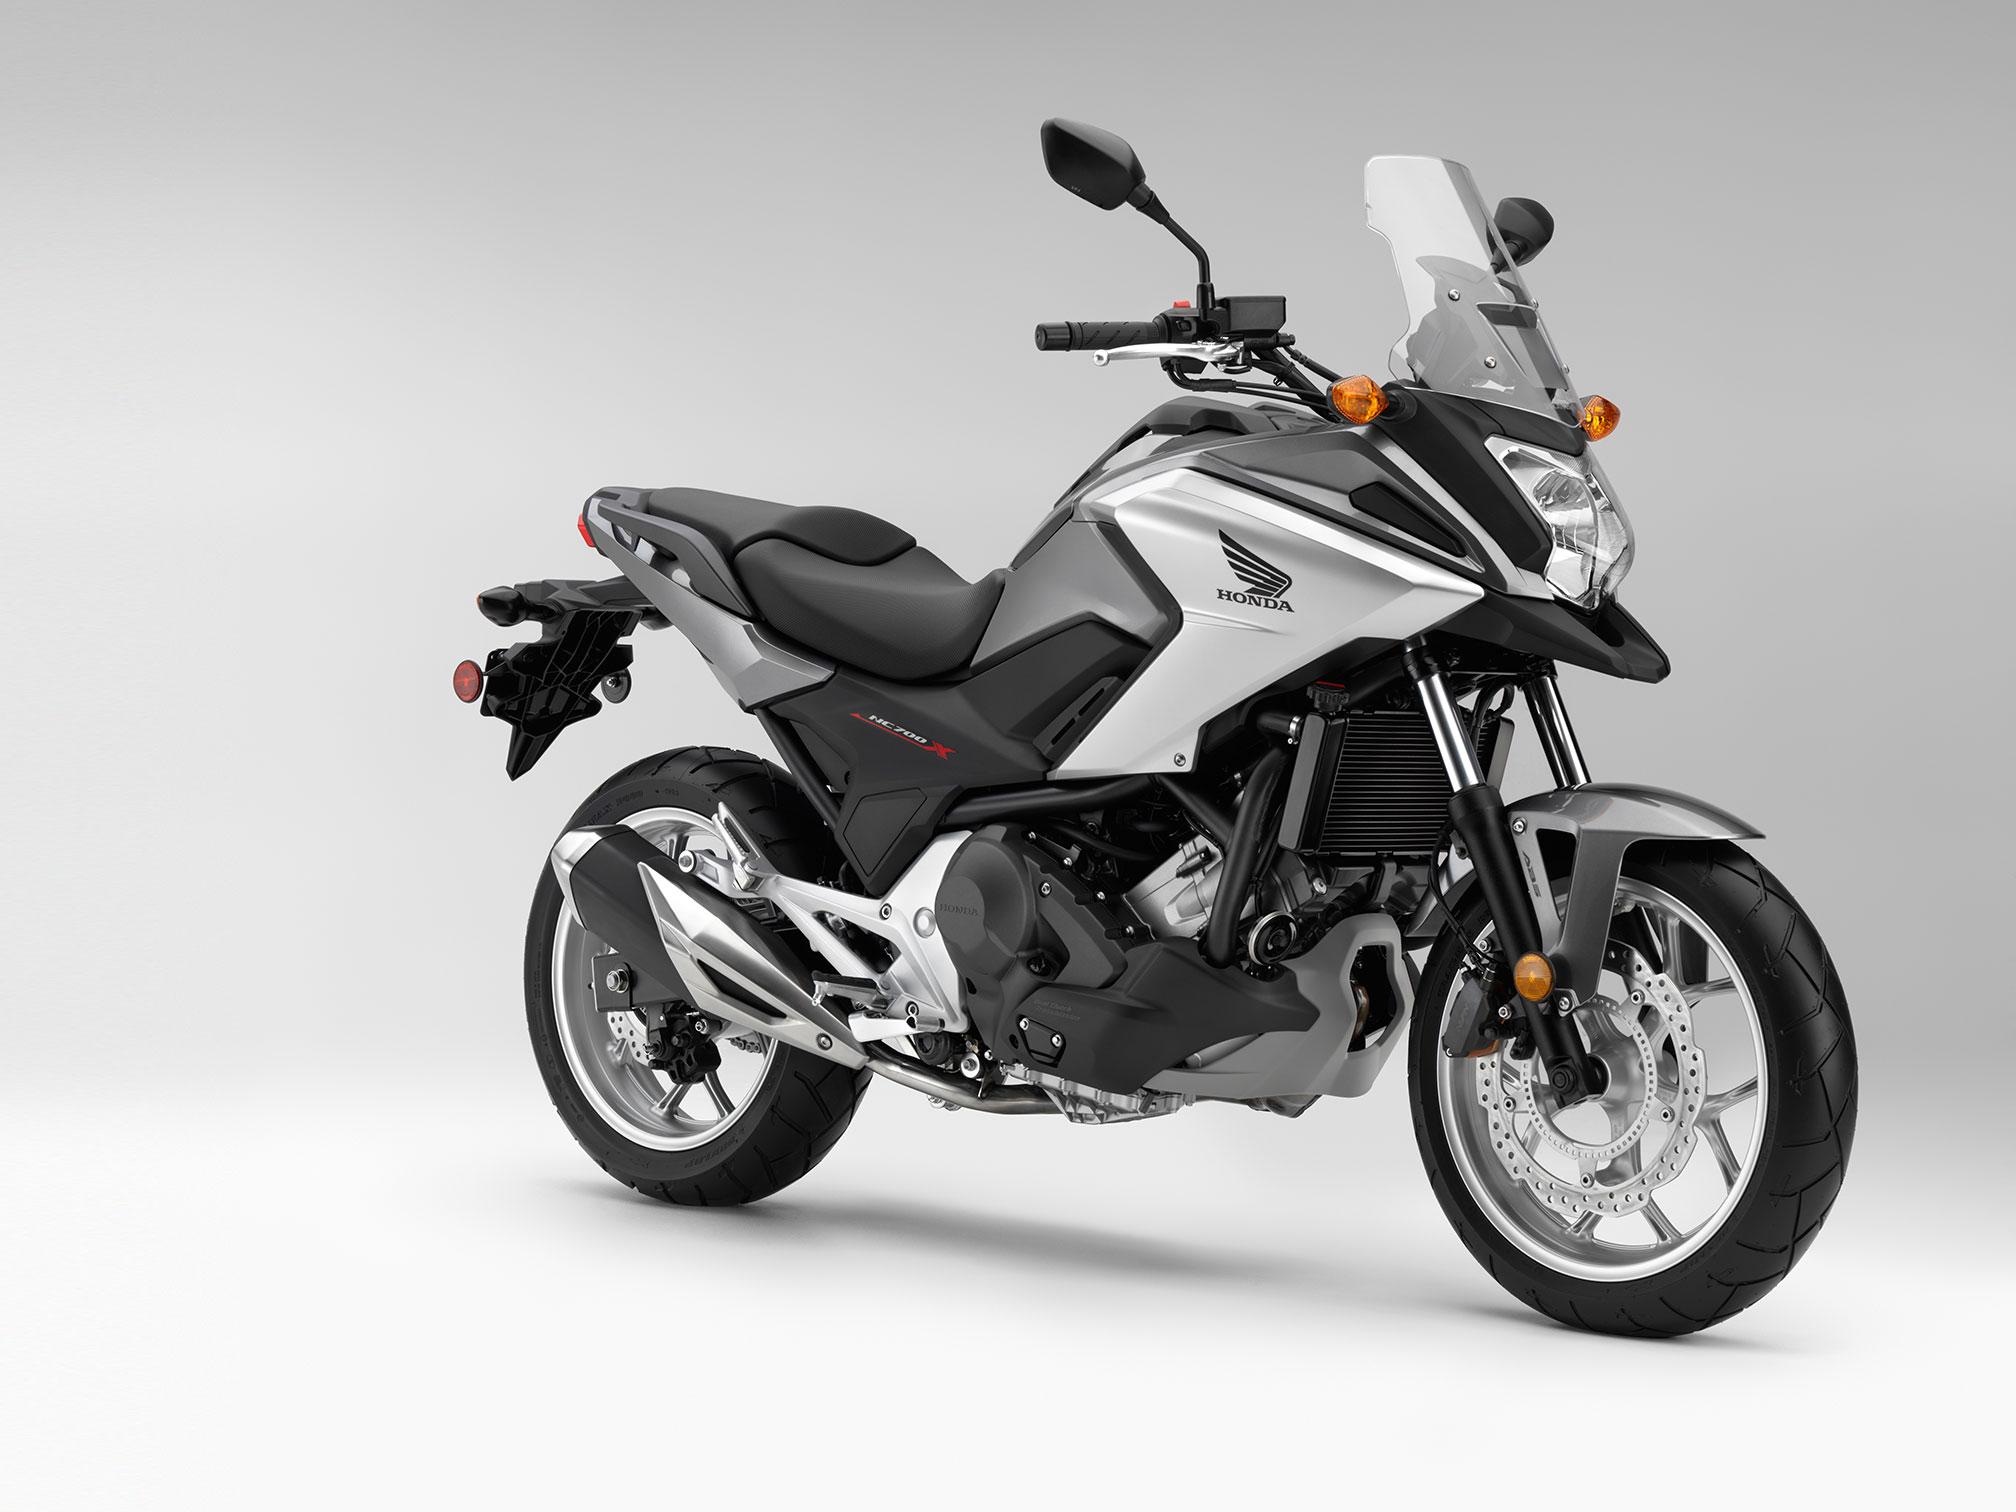 2016 Honda Nc700x Dct Abs Review